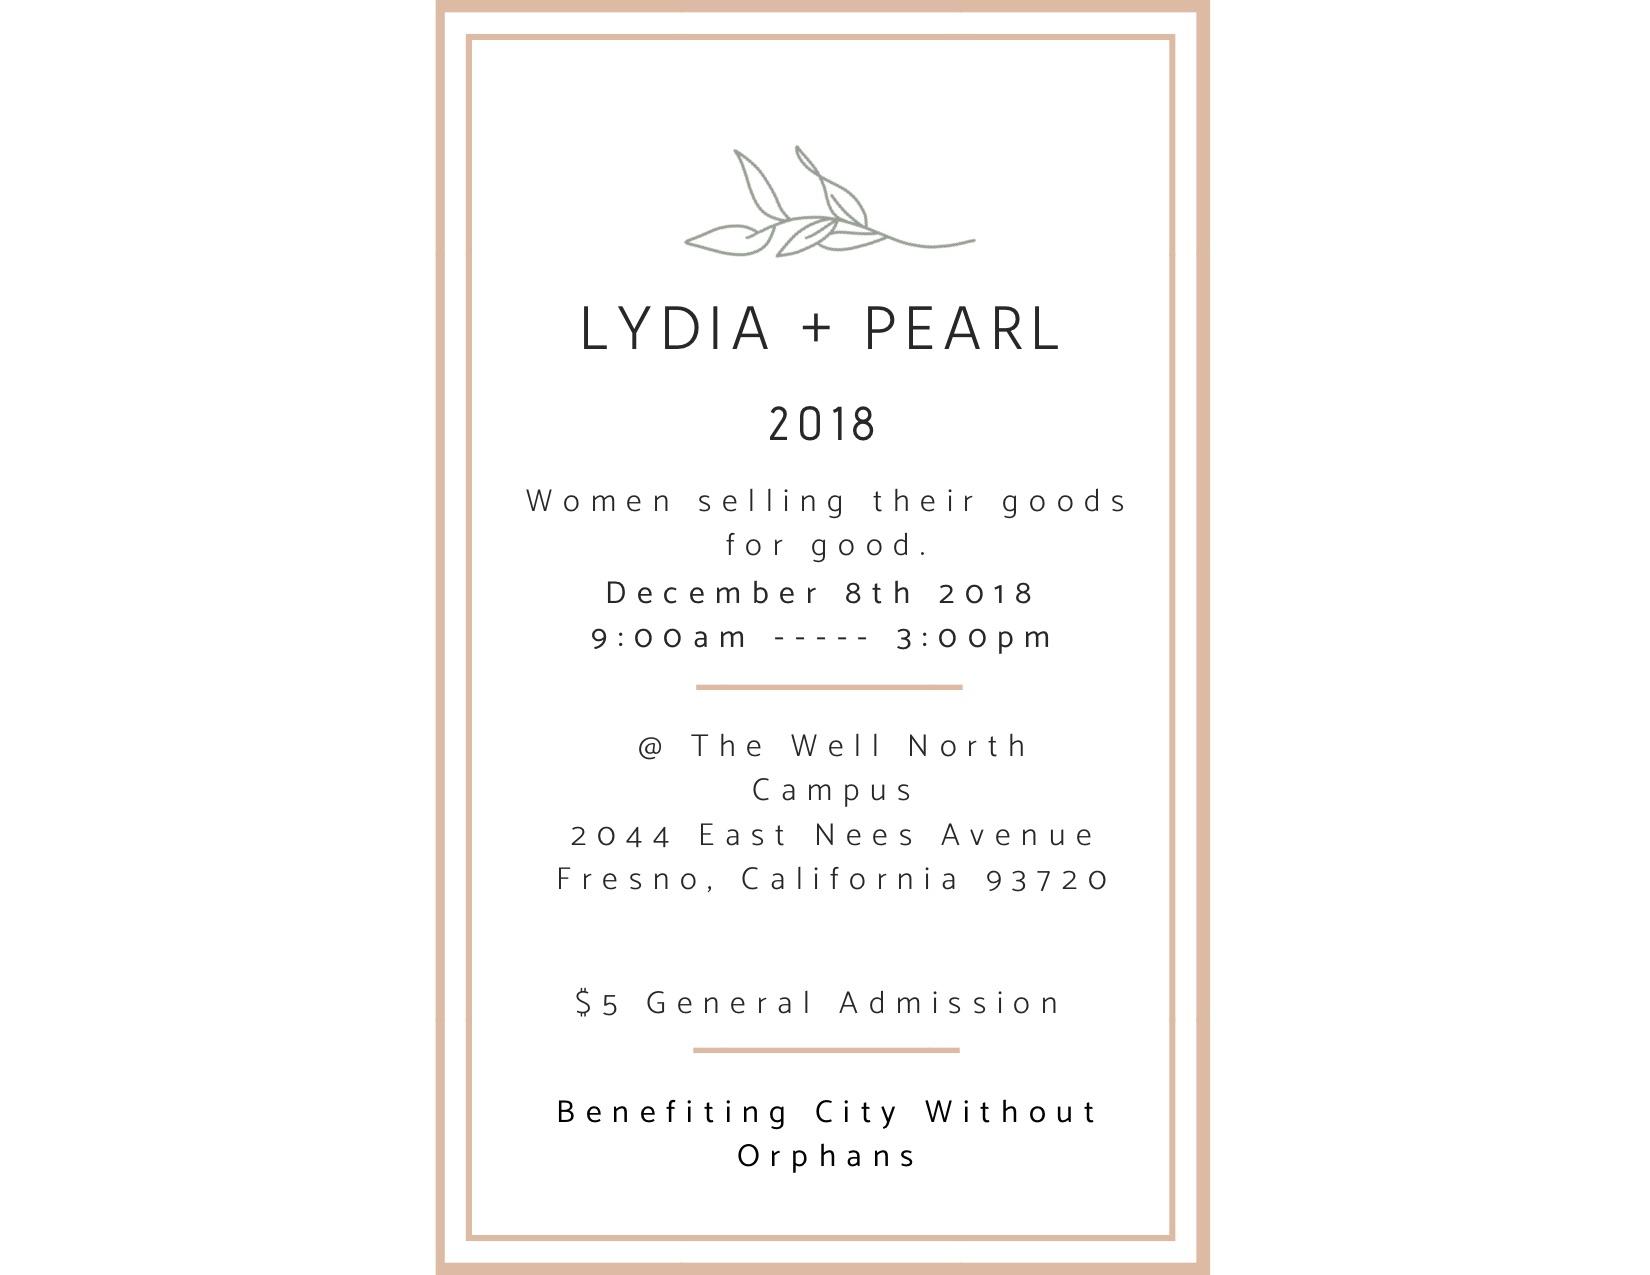 Lydia + Pearl Flyer